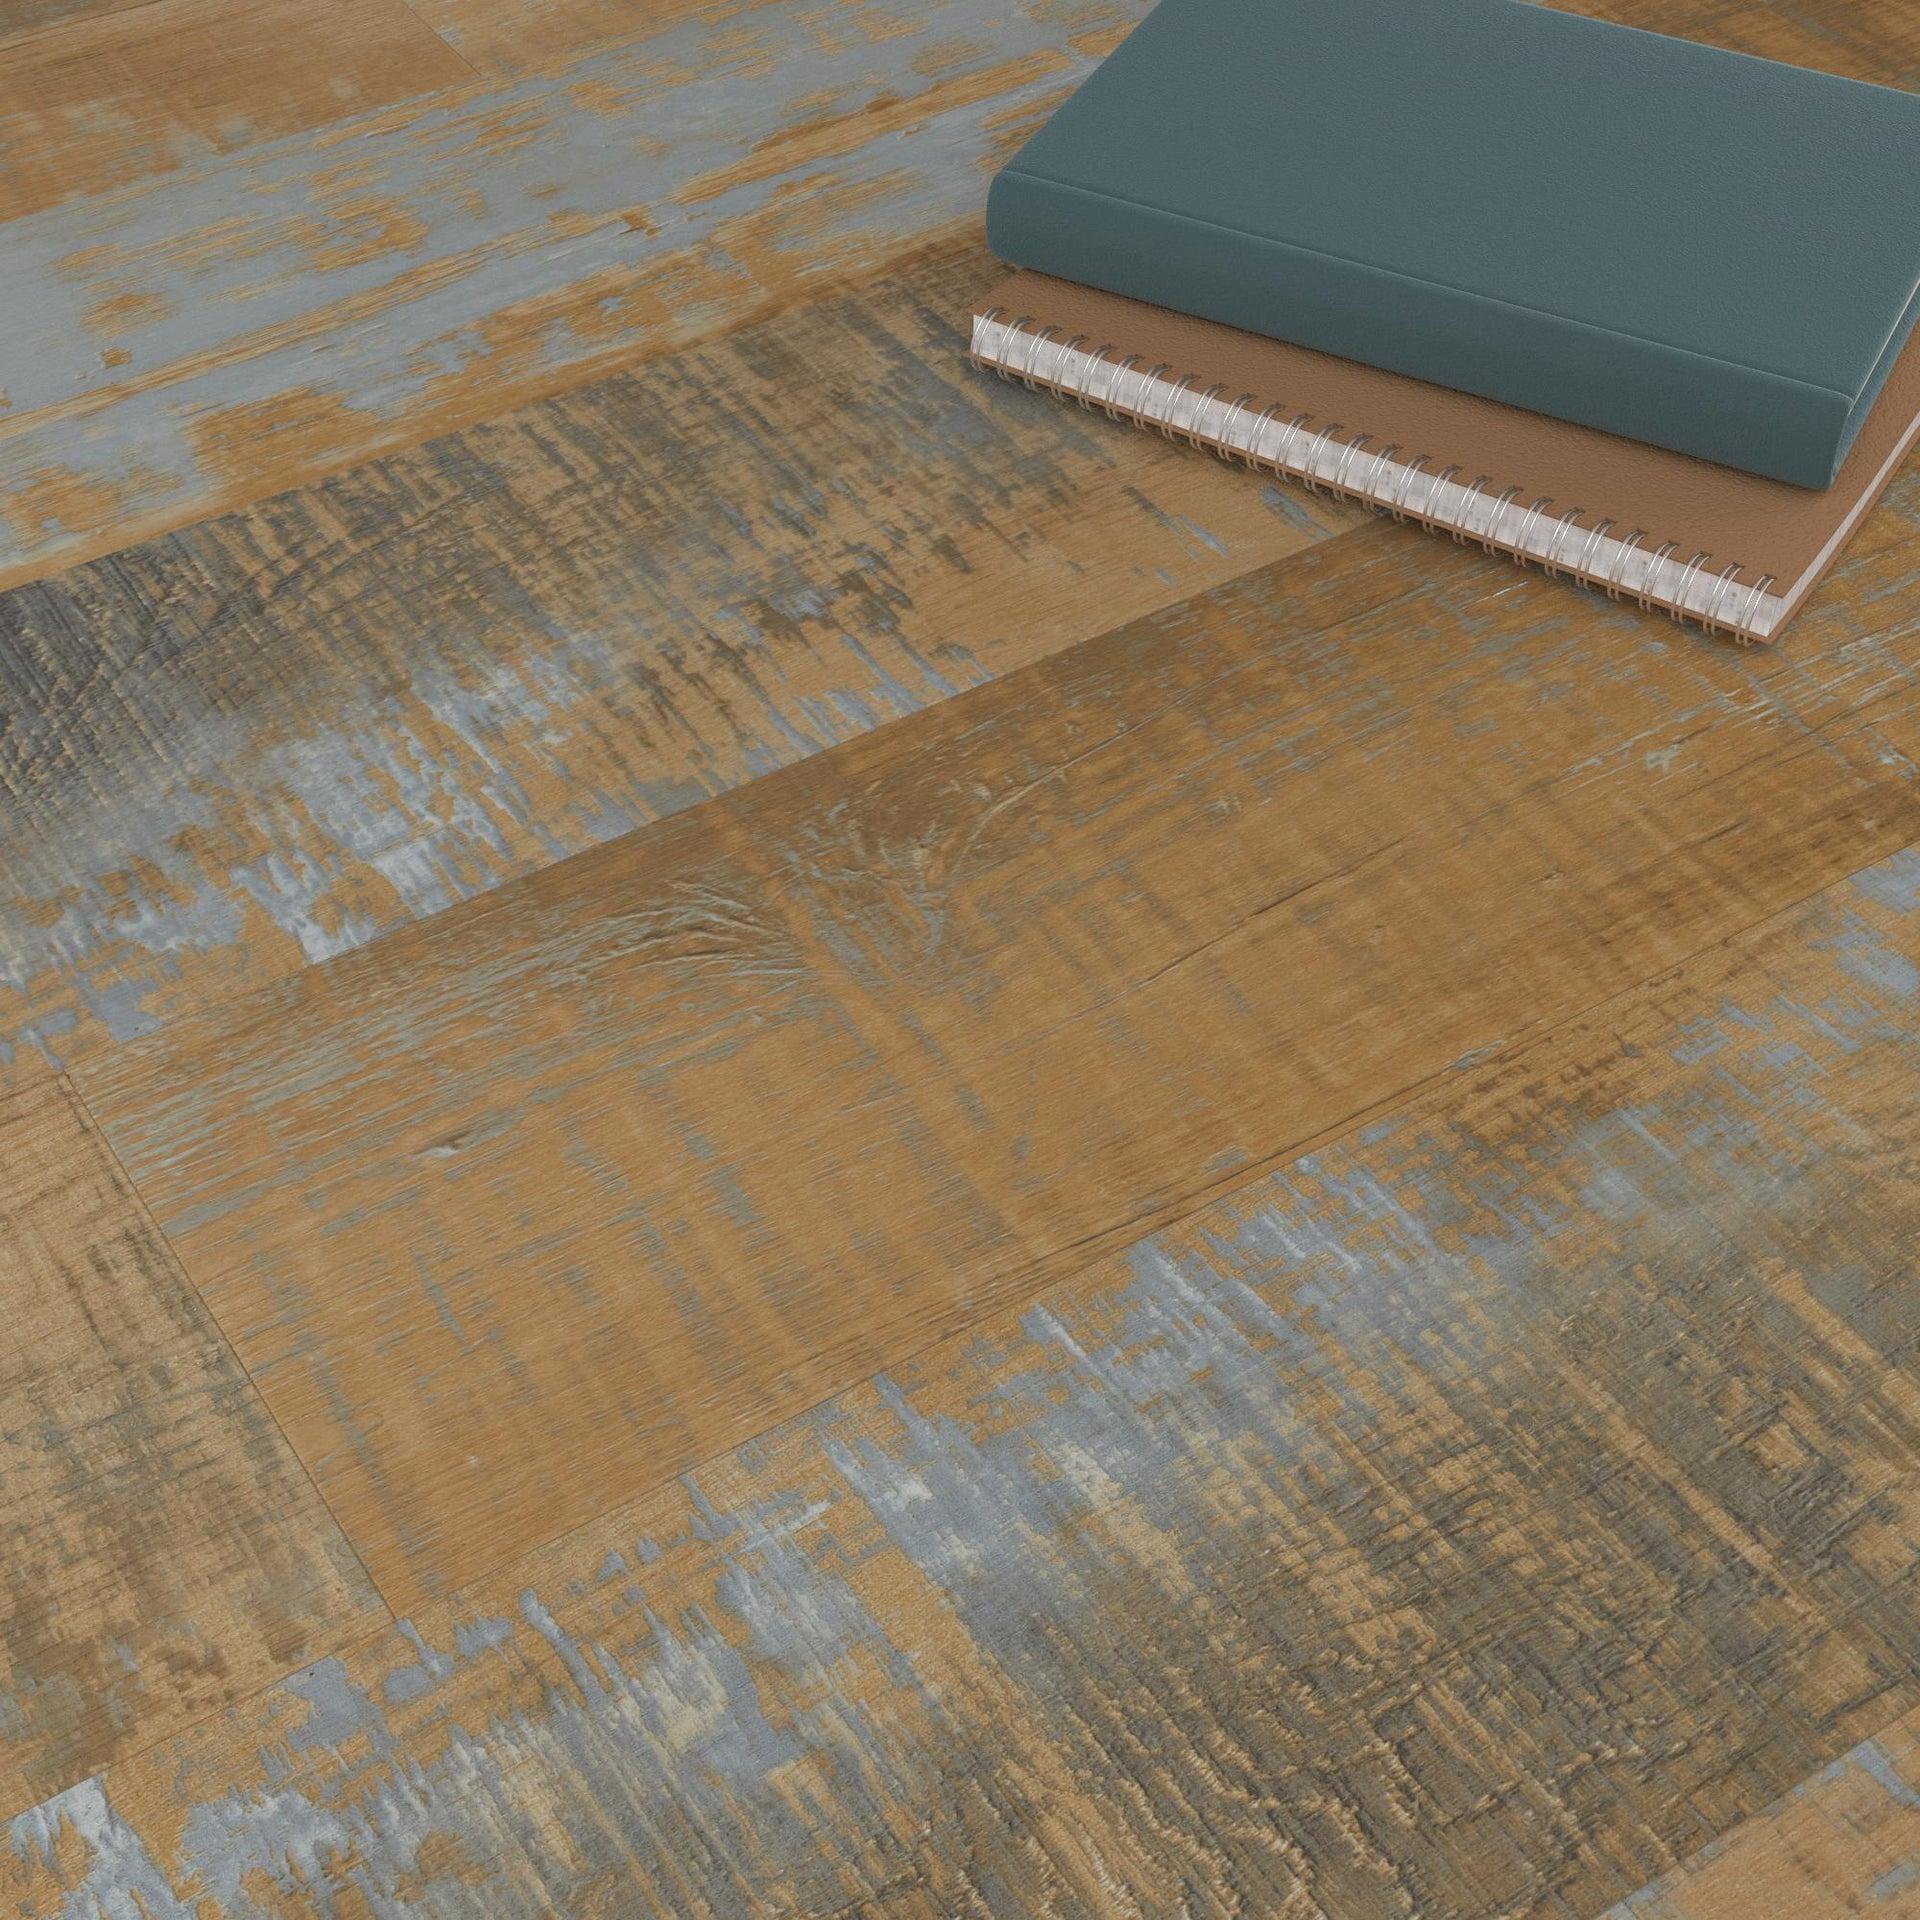 Pavimento PVC adesivo Mungo Sp 2 mm giallo / dorato - 4